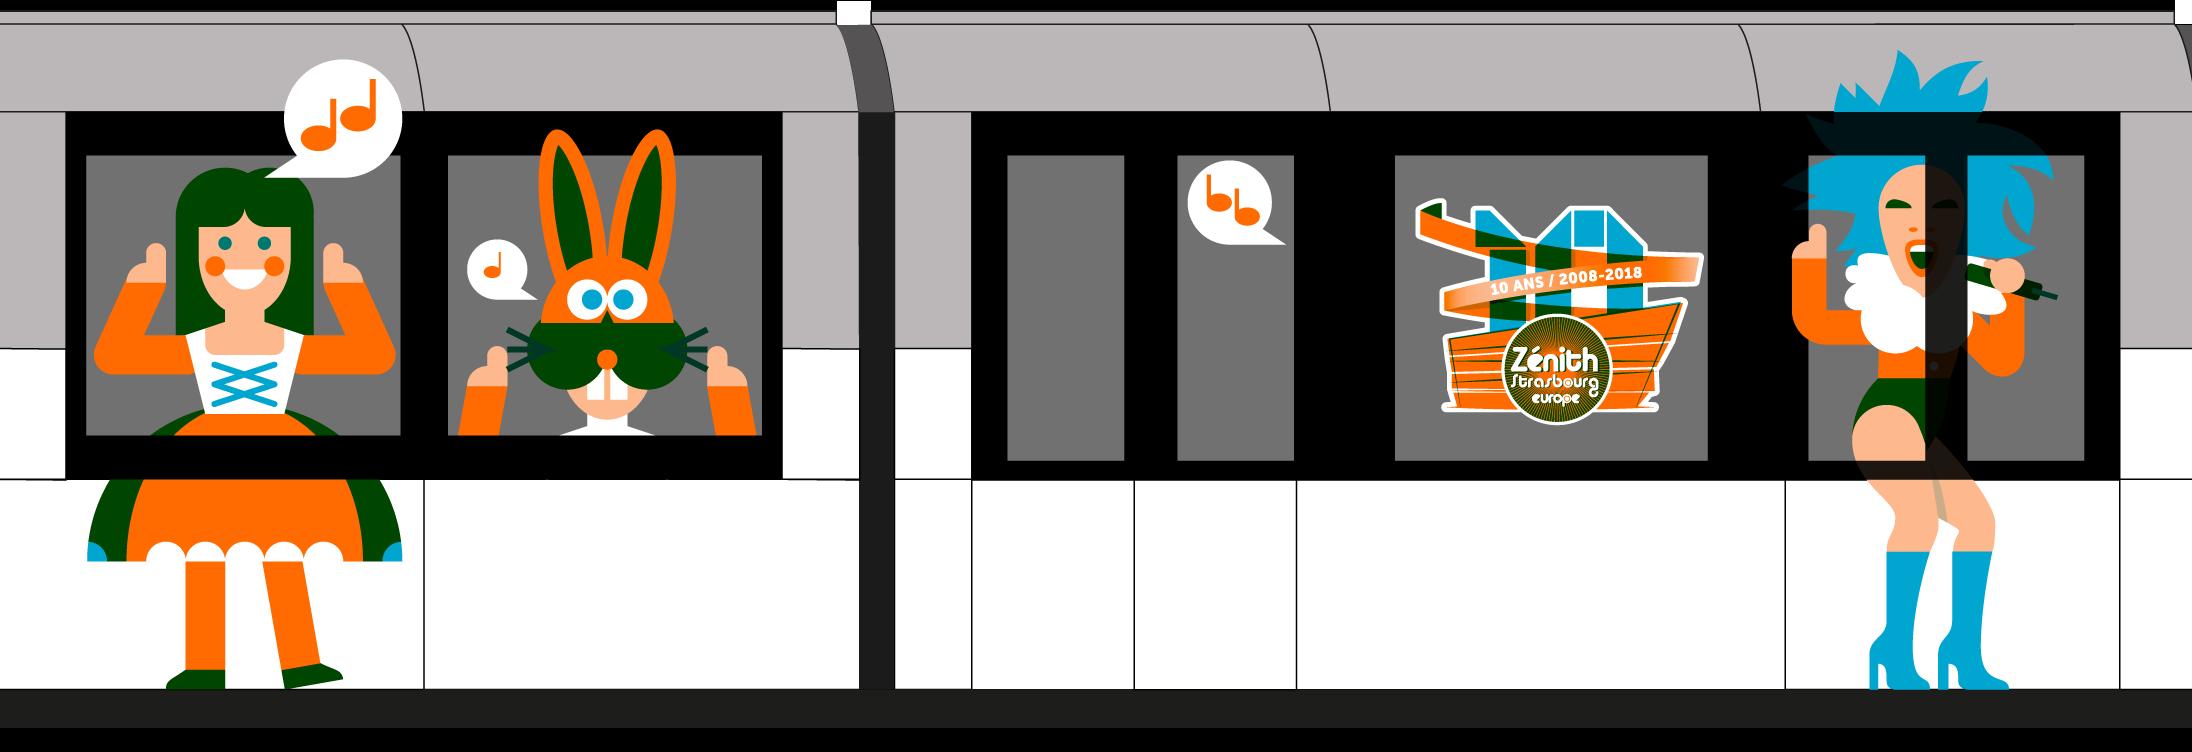 zenith-tramway-032-1